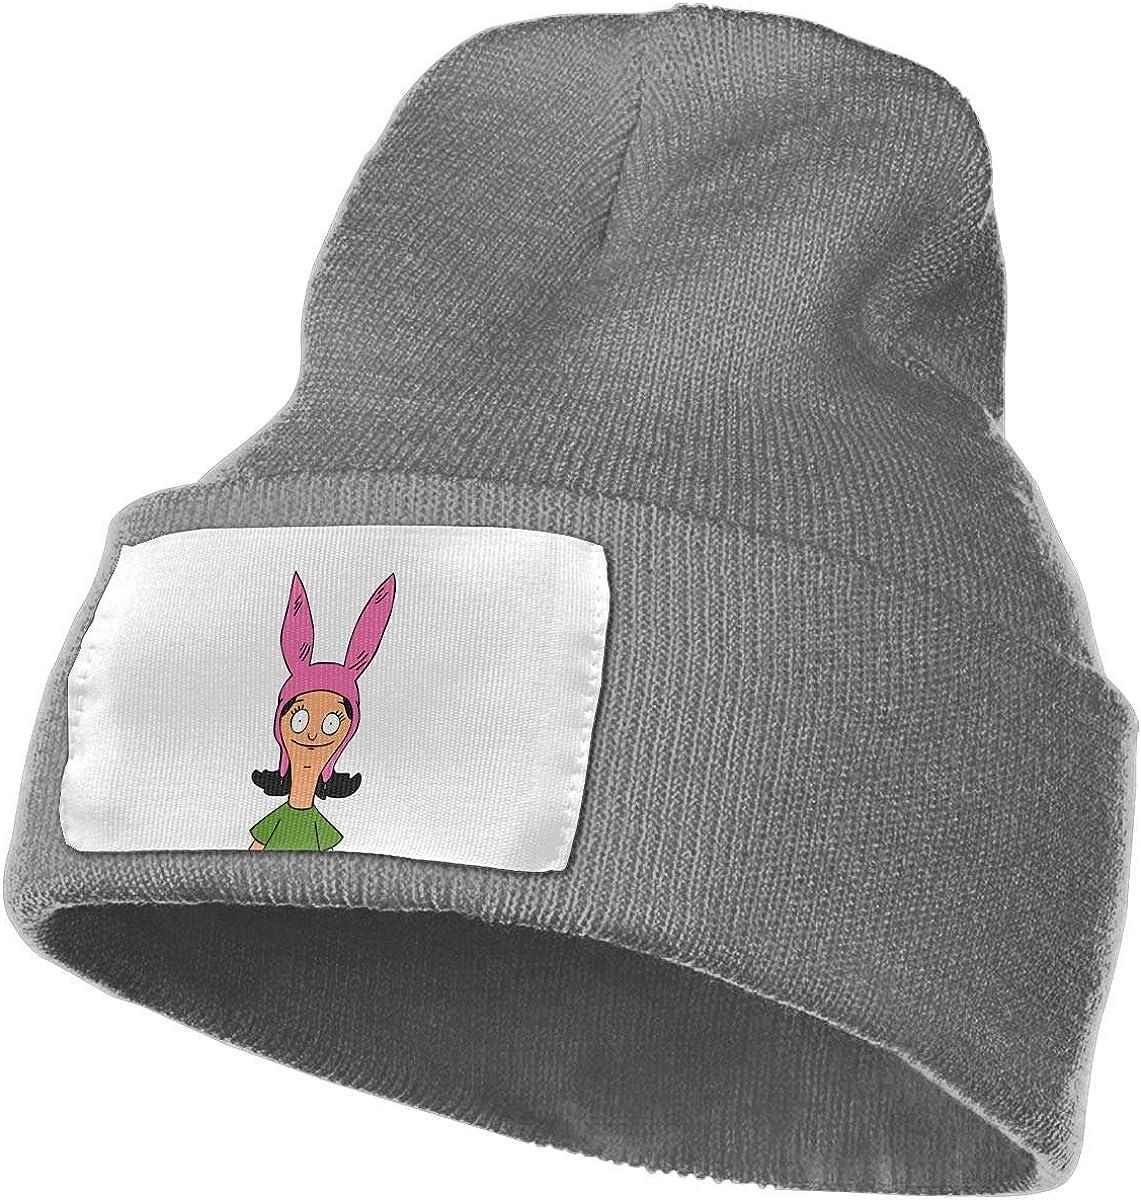 Bobs Burger Classic Winter Warm Knit Hat Beanie Cap for Men Women